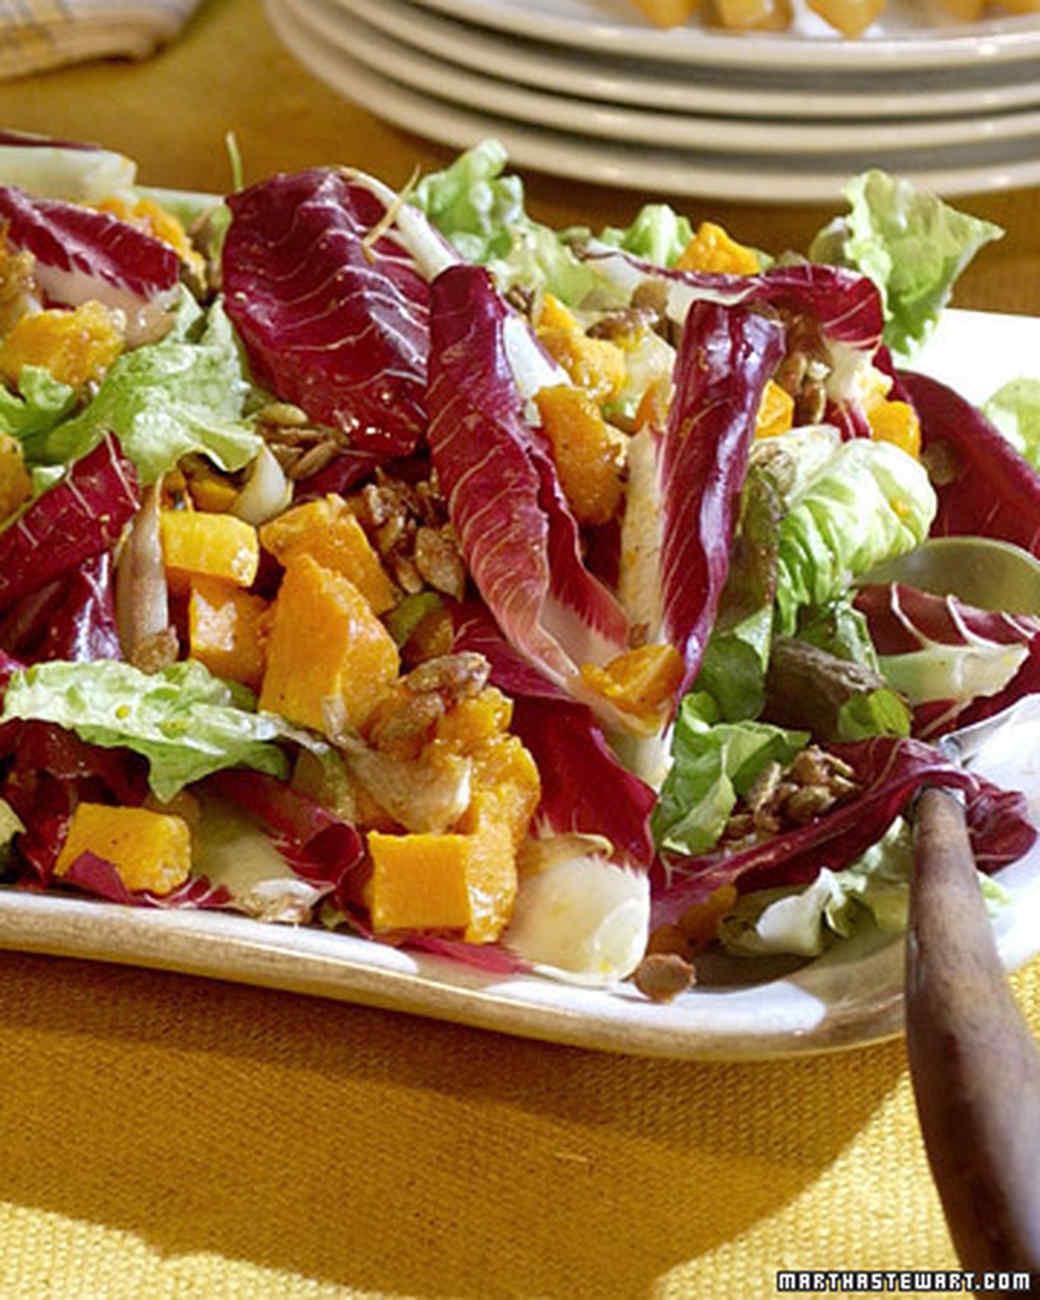 Decomposed Salad